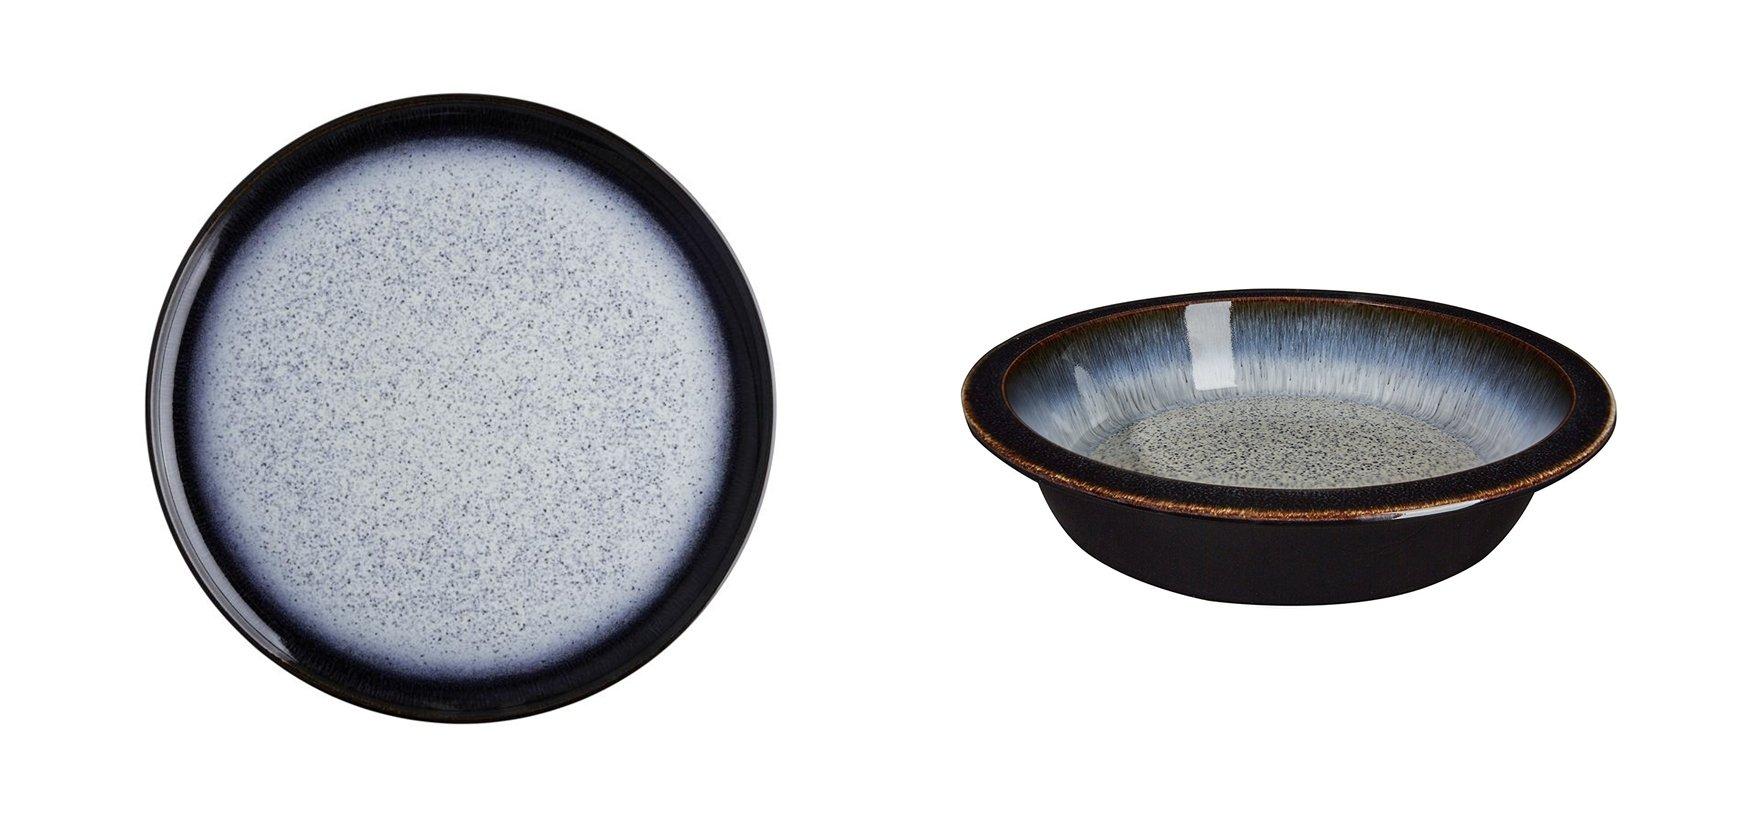 Denby Halo Round Platter and Round Pie Dish, Set of 2